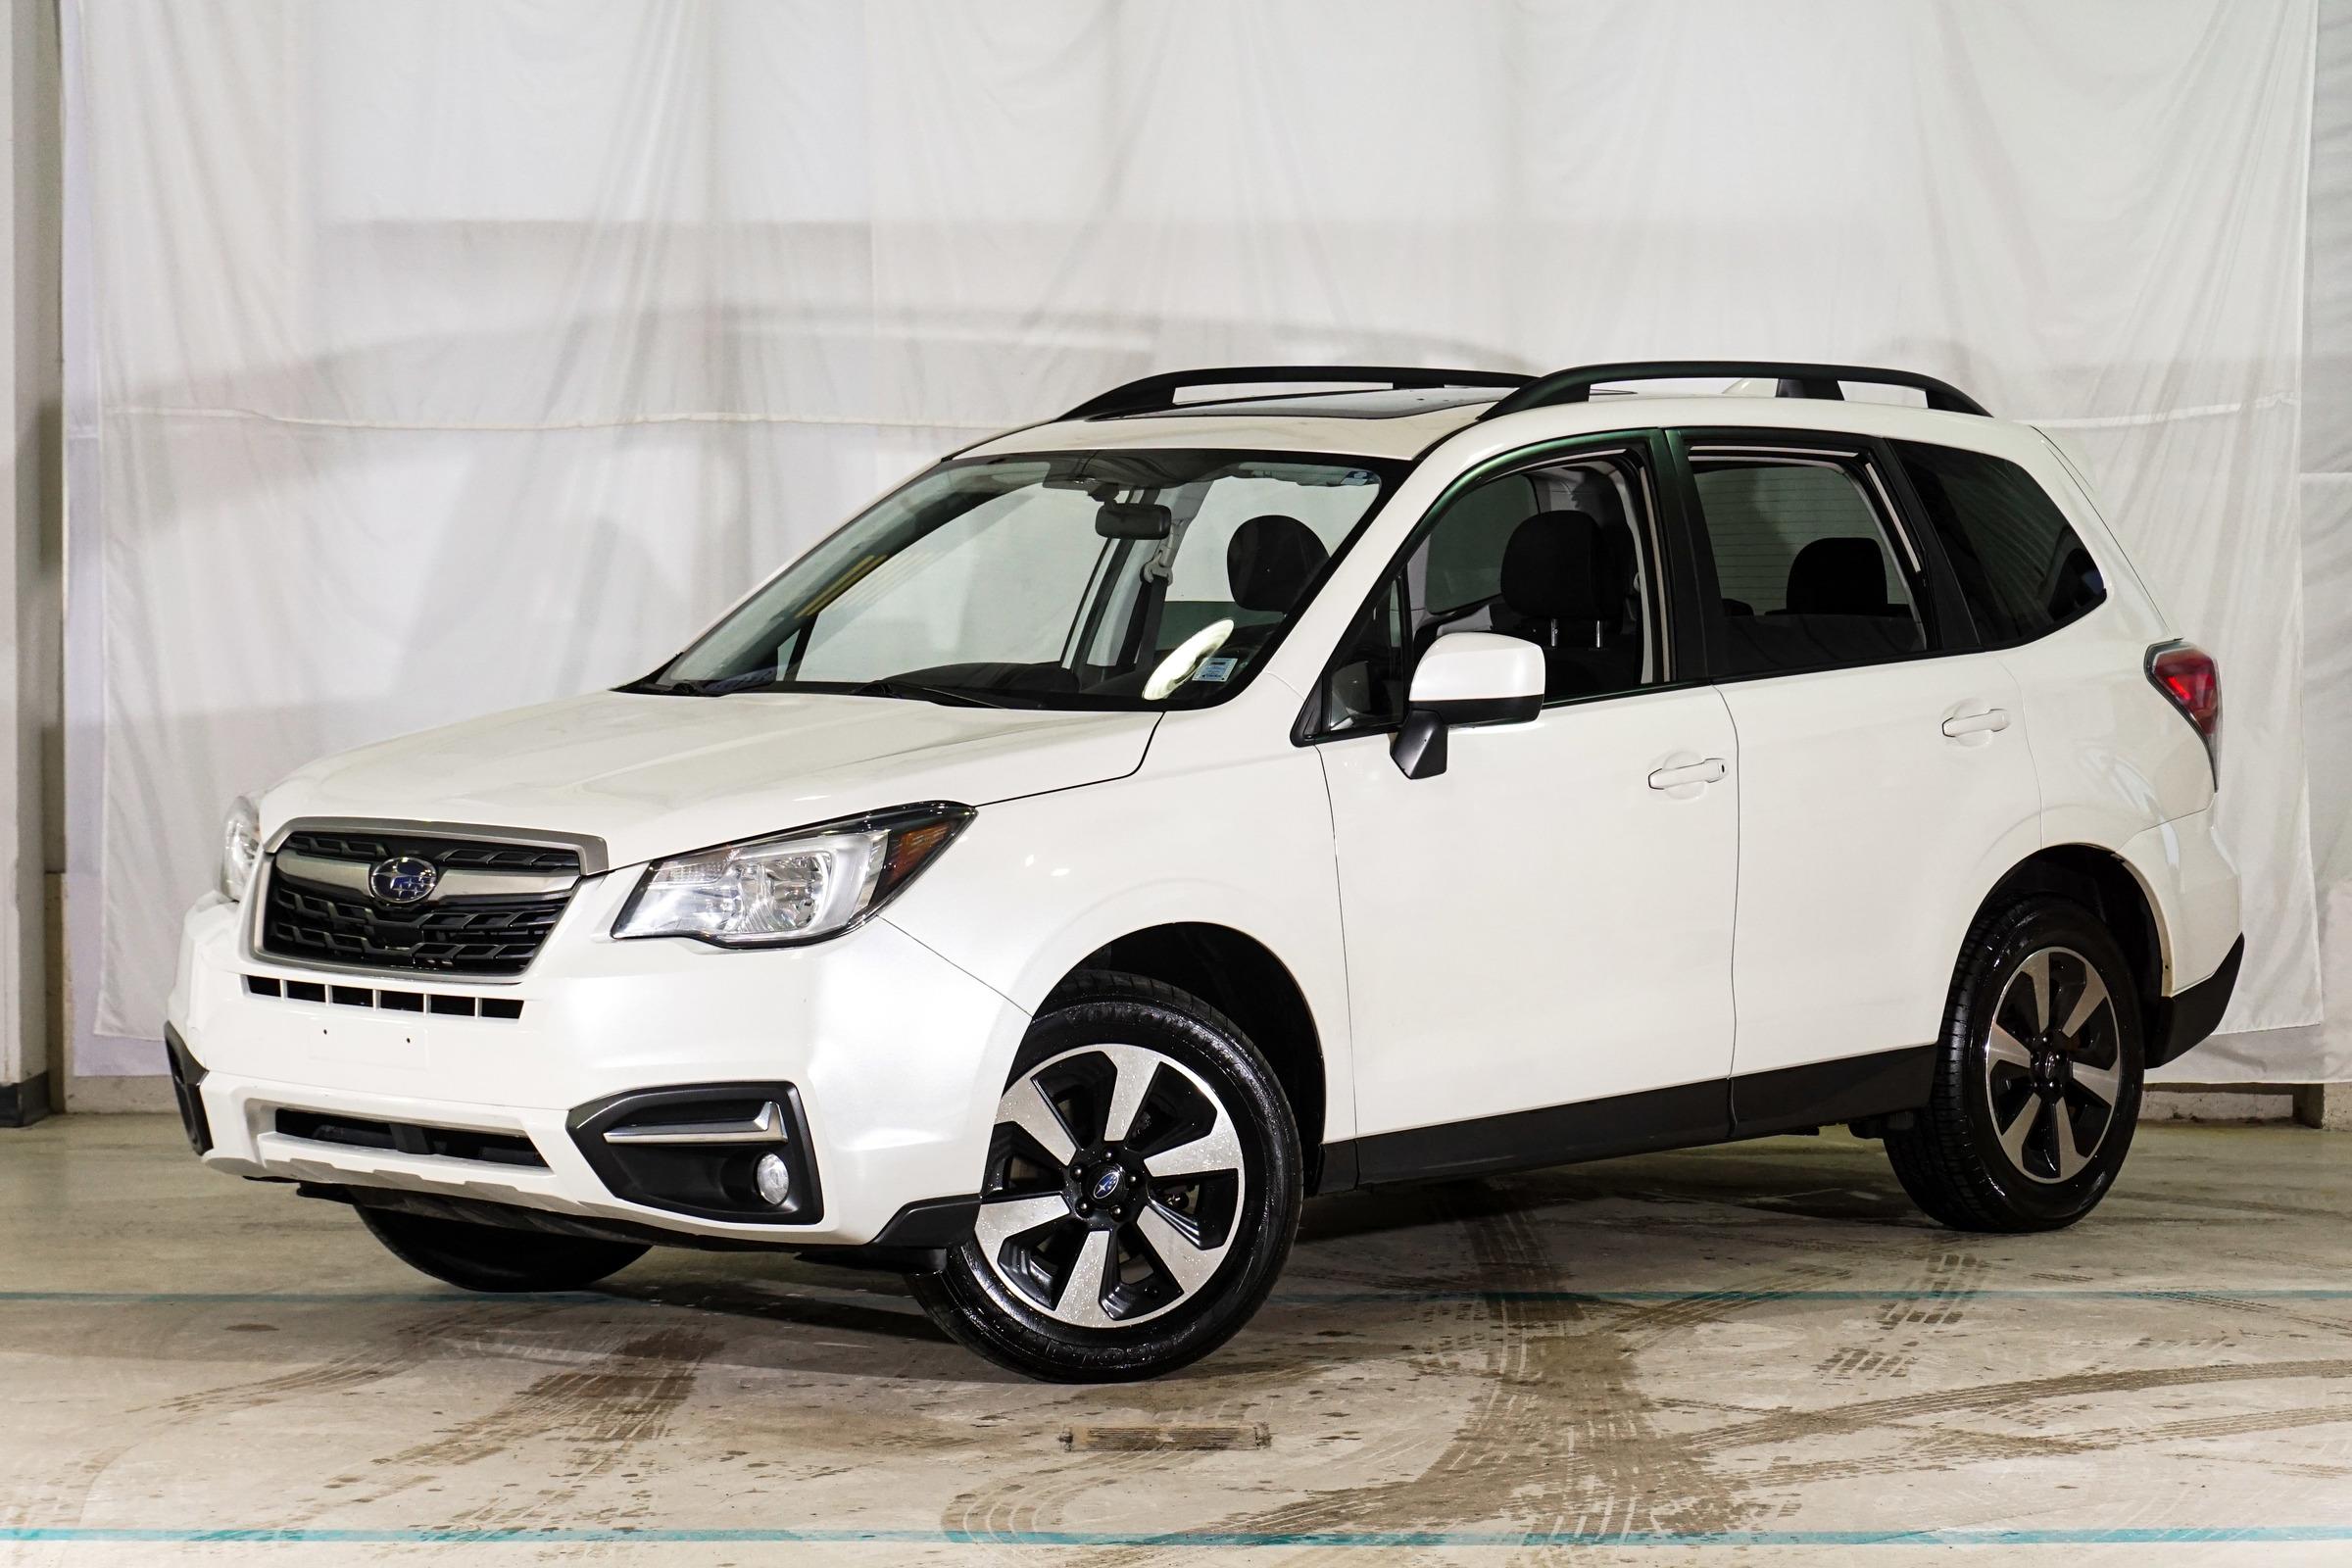 White Subaru Forester 2.5i Touring